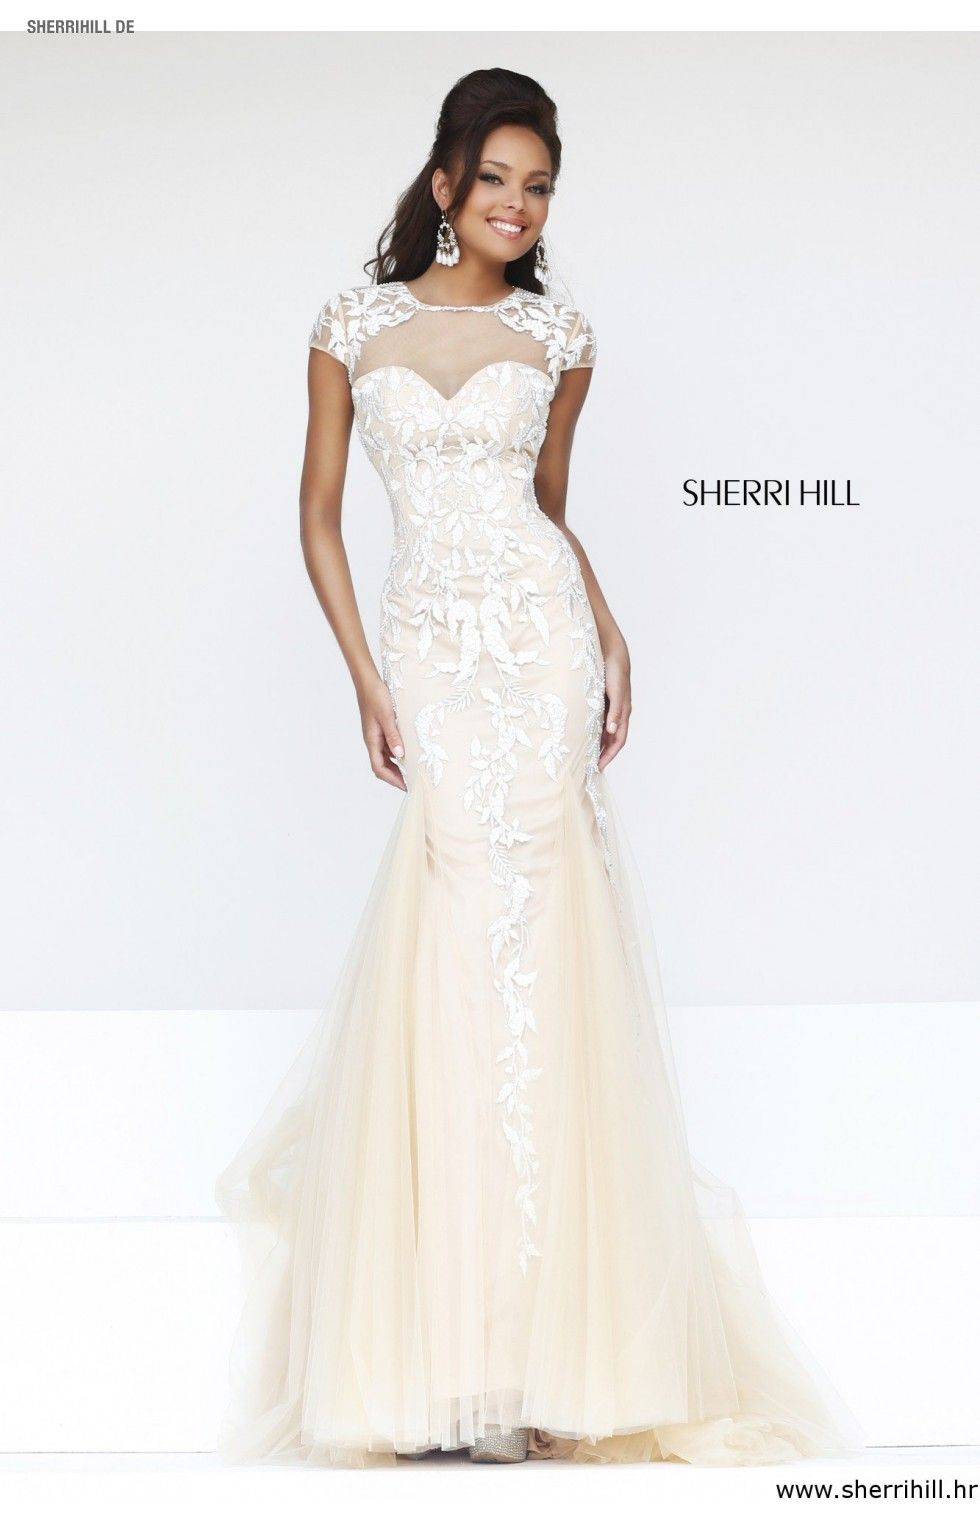 Sherri hill frühjahr gowns pinterest gowns